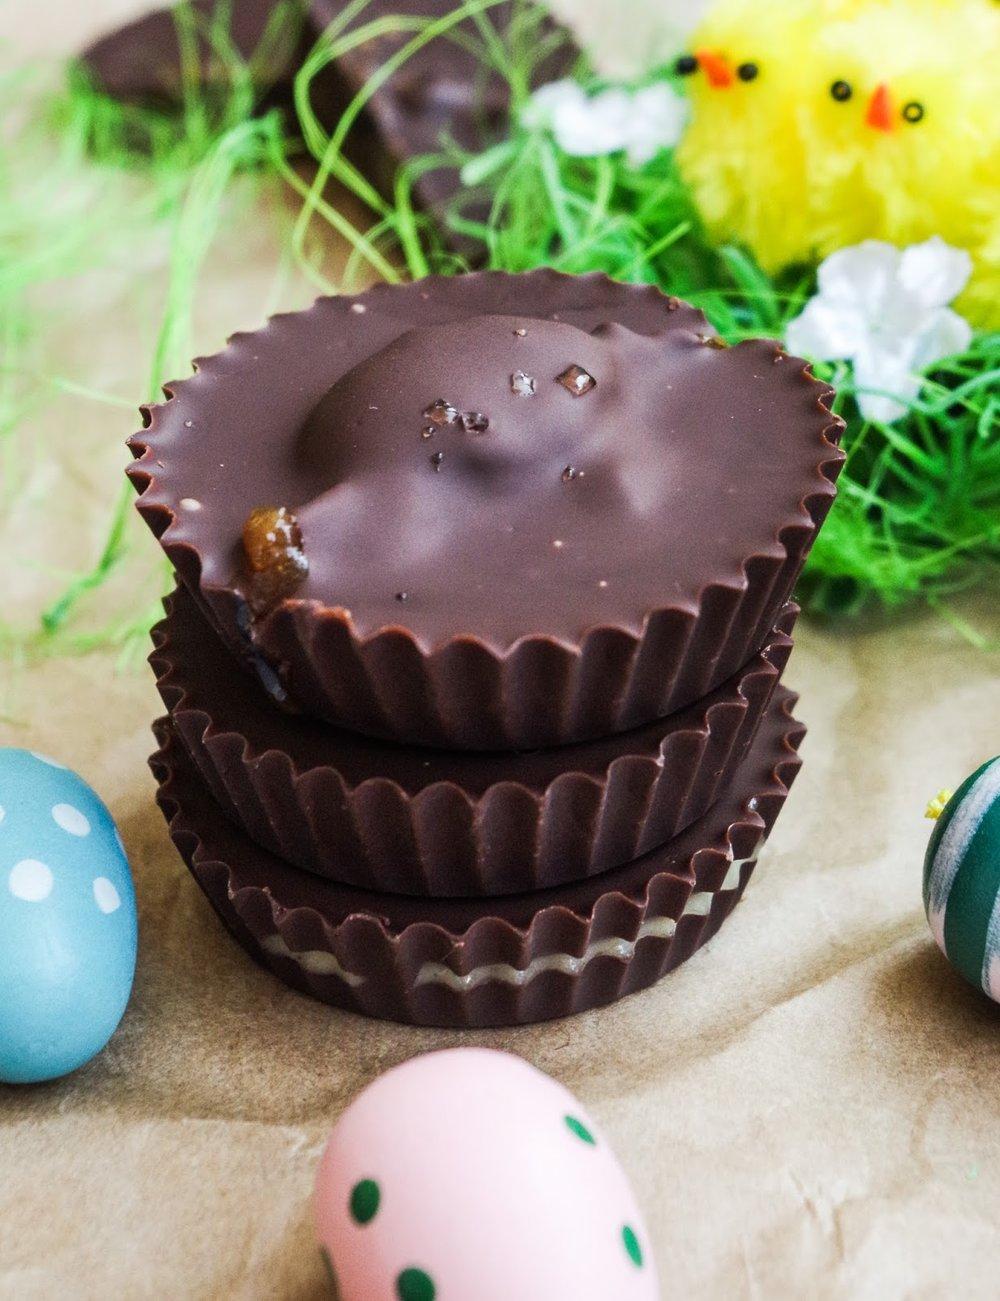 Easter Chocolate Cups in 3 flavors: Salted Vanilla Caramel, Cashew Cream Egg, Hot Cross Bun by Cassidy of Euphoric Vegan